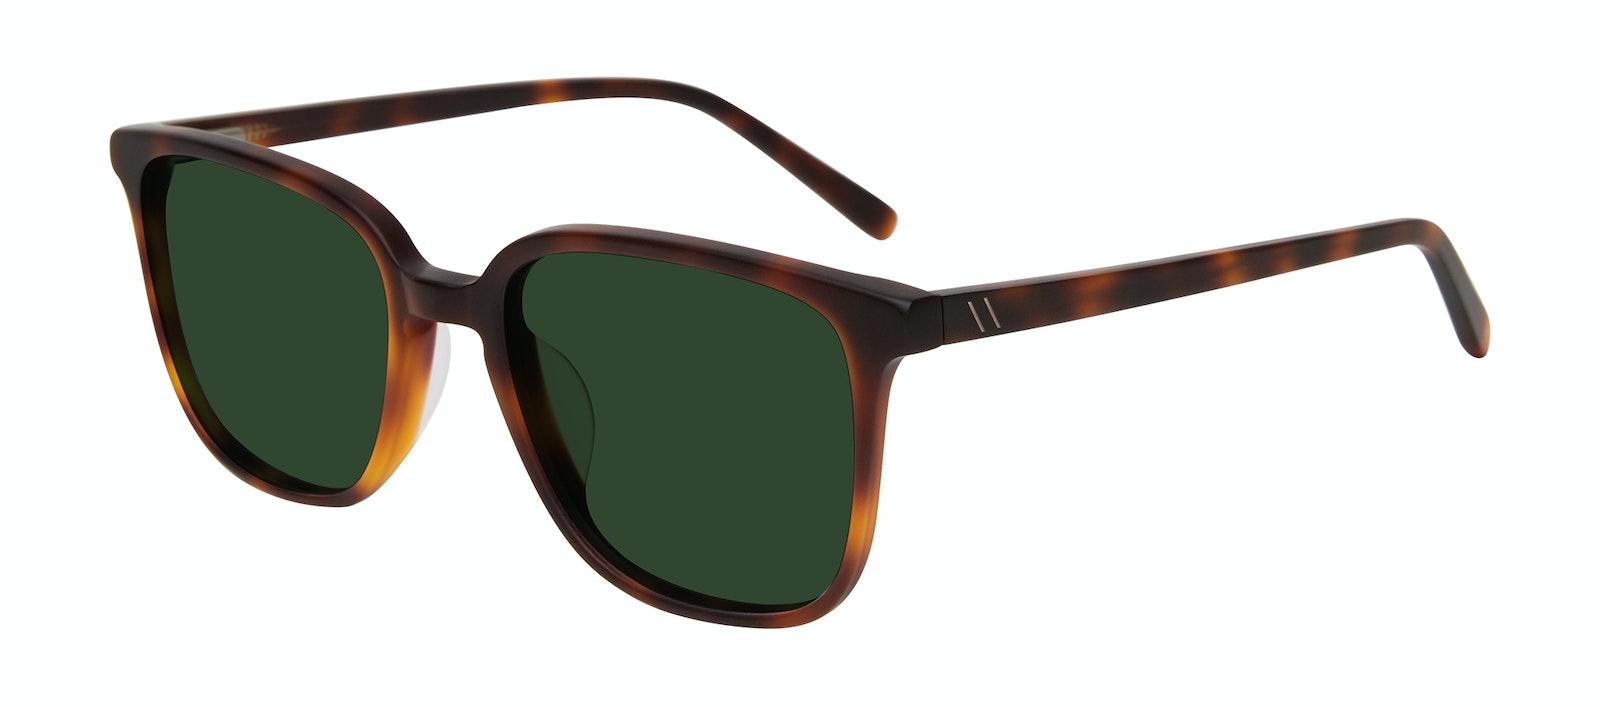 Affordable Fashion Glasses Square Sunglasses Men Fellow Matte Tortoise Tilt